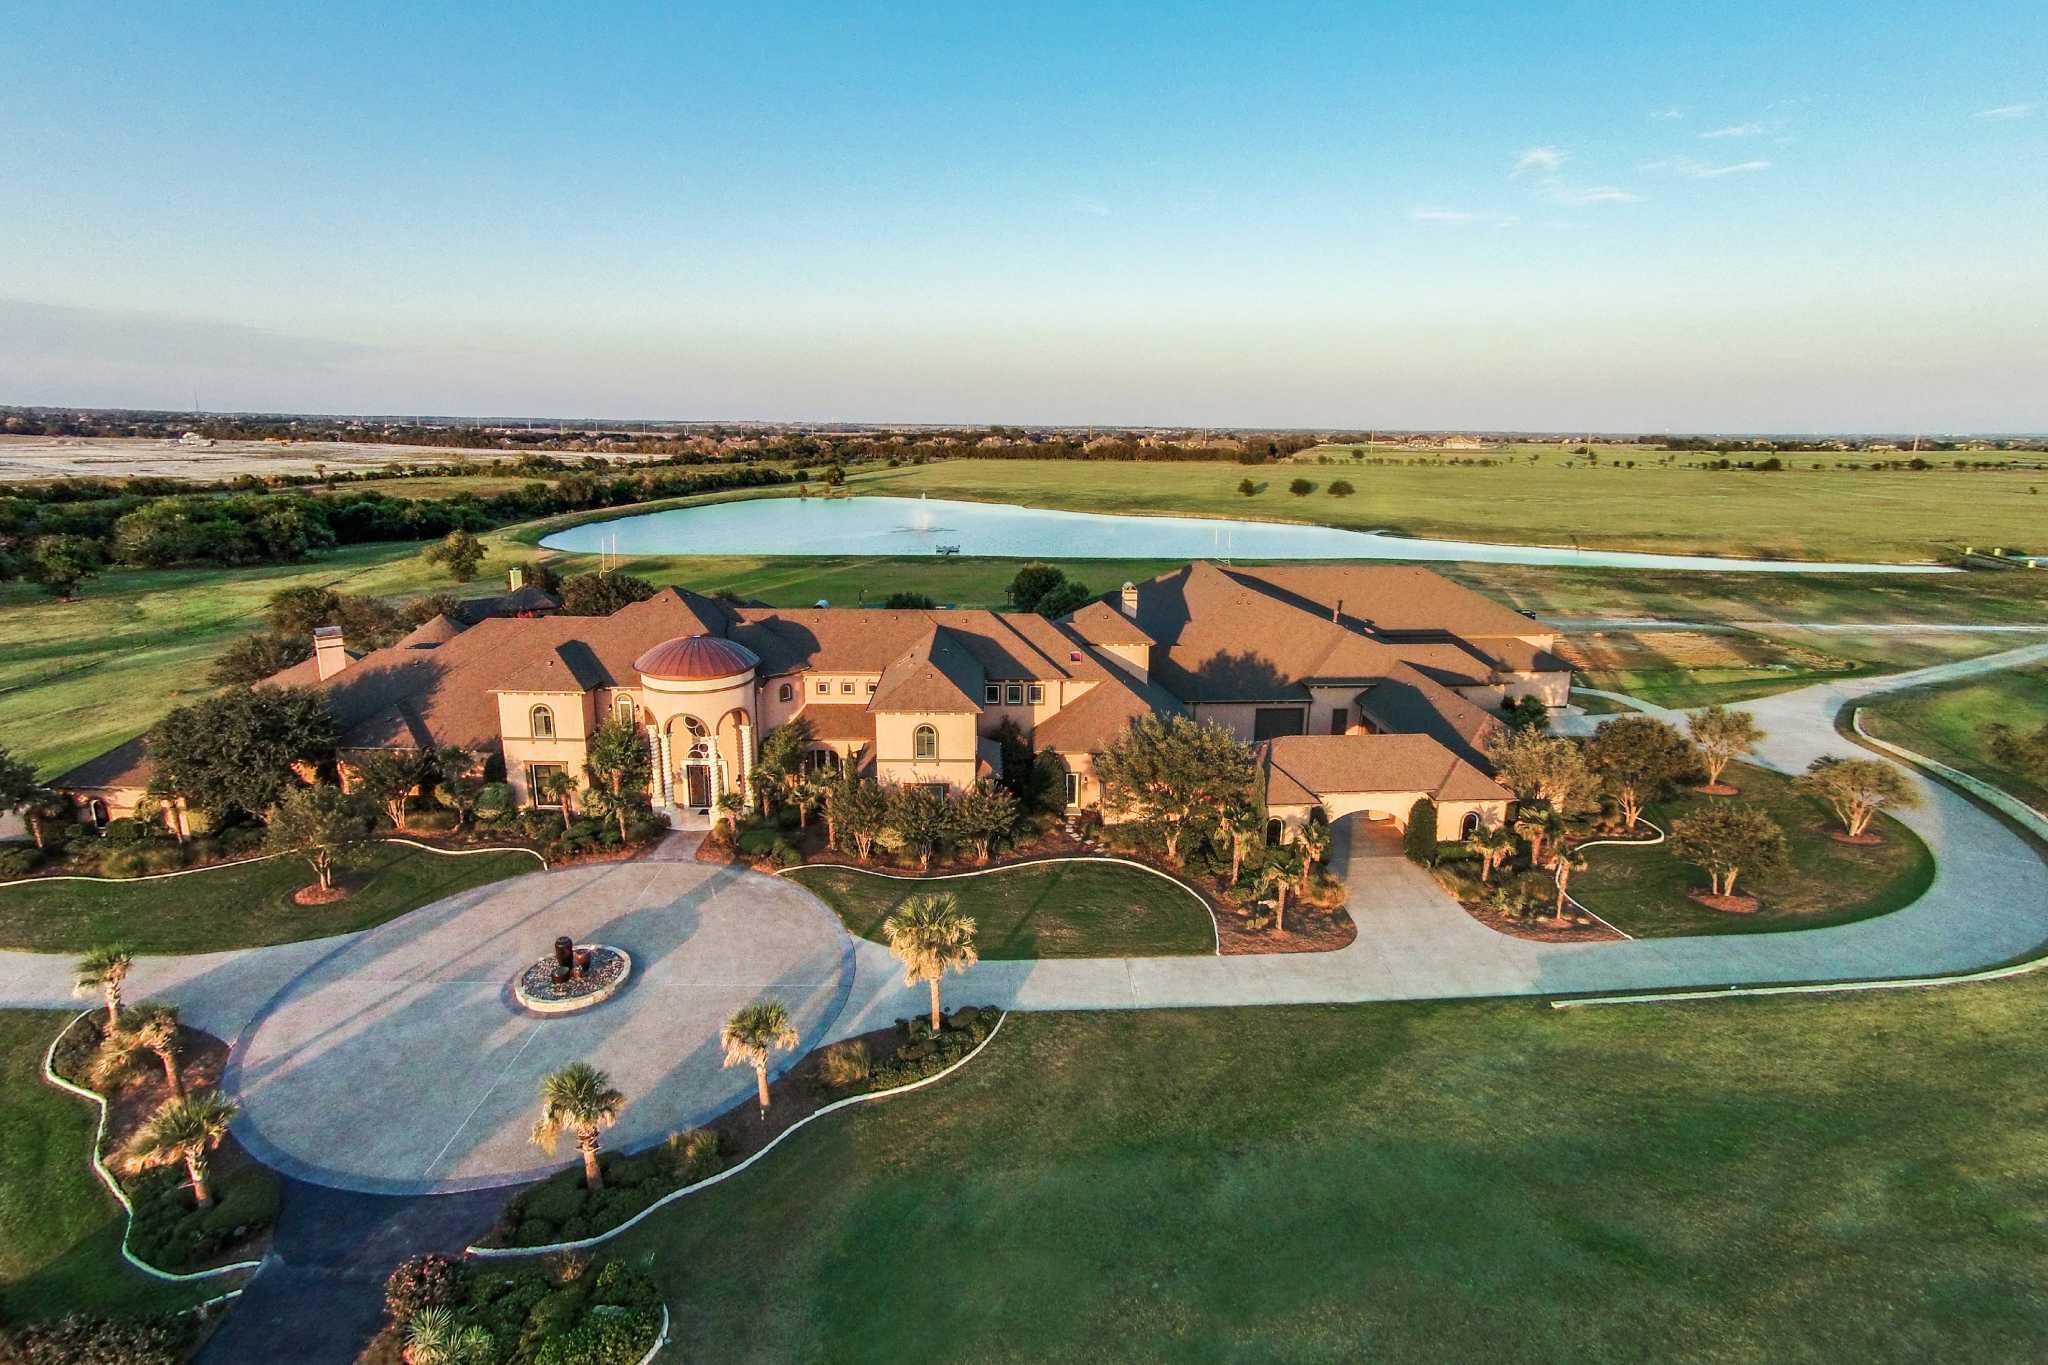 Take a look at this former Dallas Cowboys' $5.75M mansion